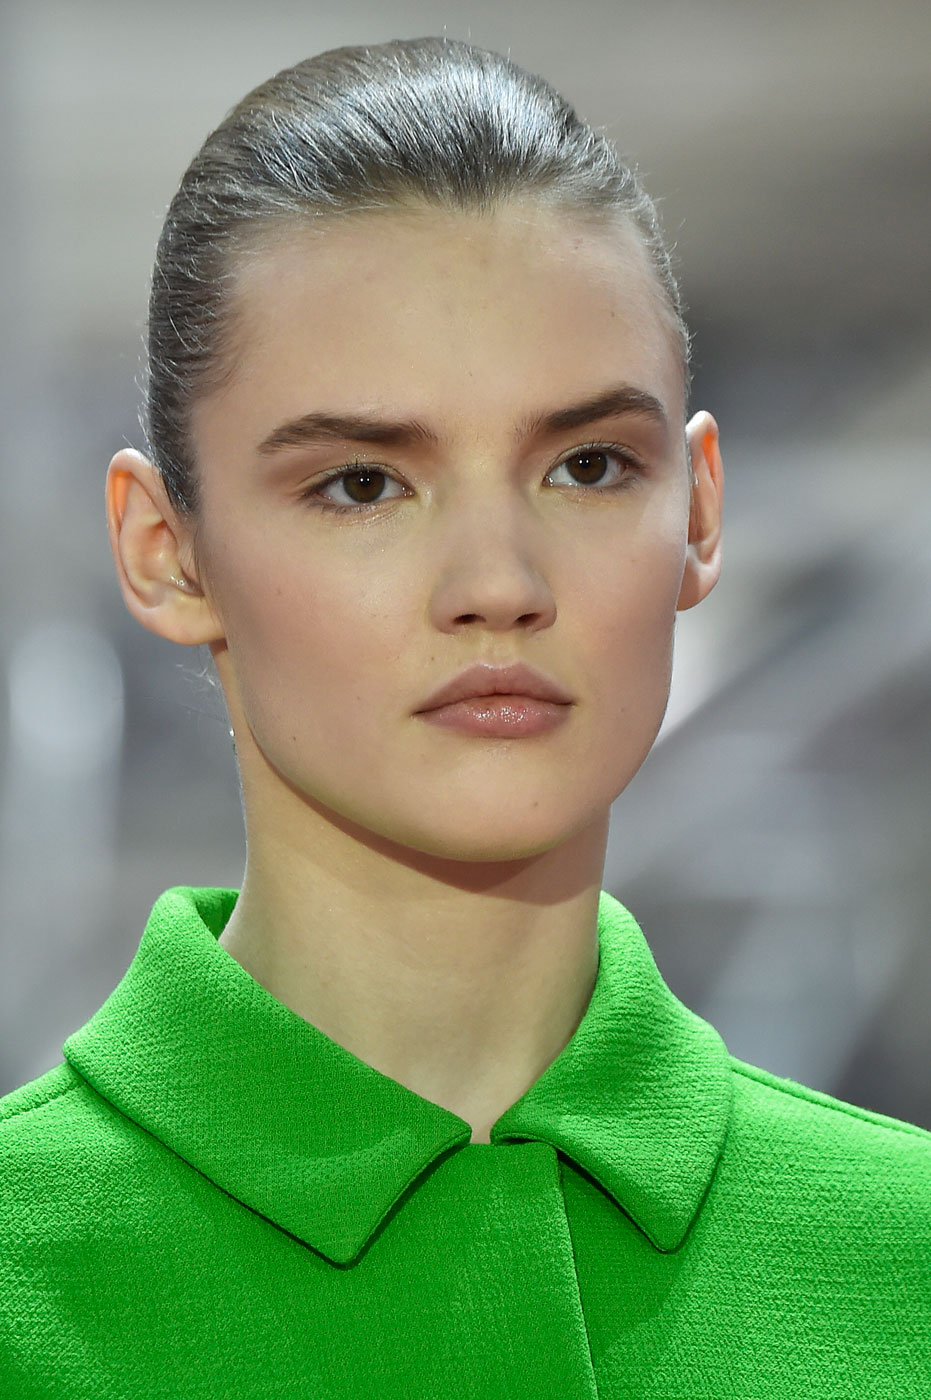 Christian-Dior-fashion-runway-show-close-ups-haute-couture-paris-spring-summer-2015-the-impression-036